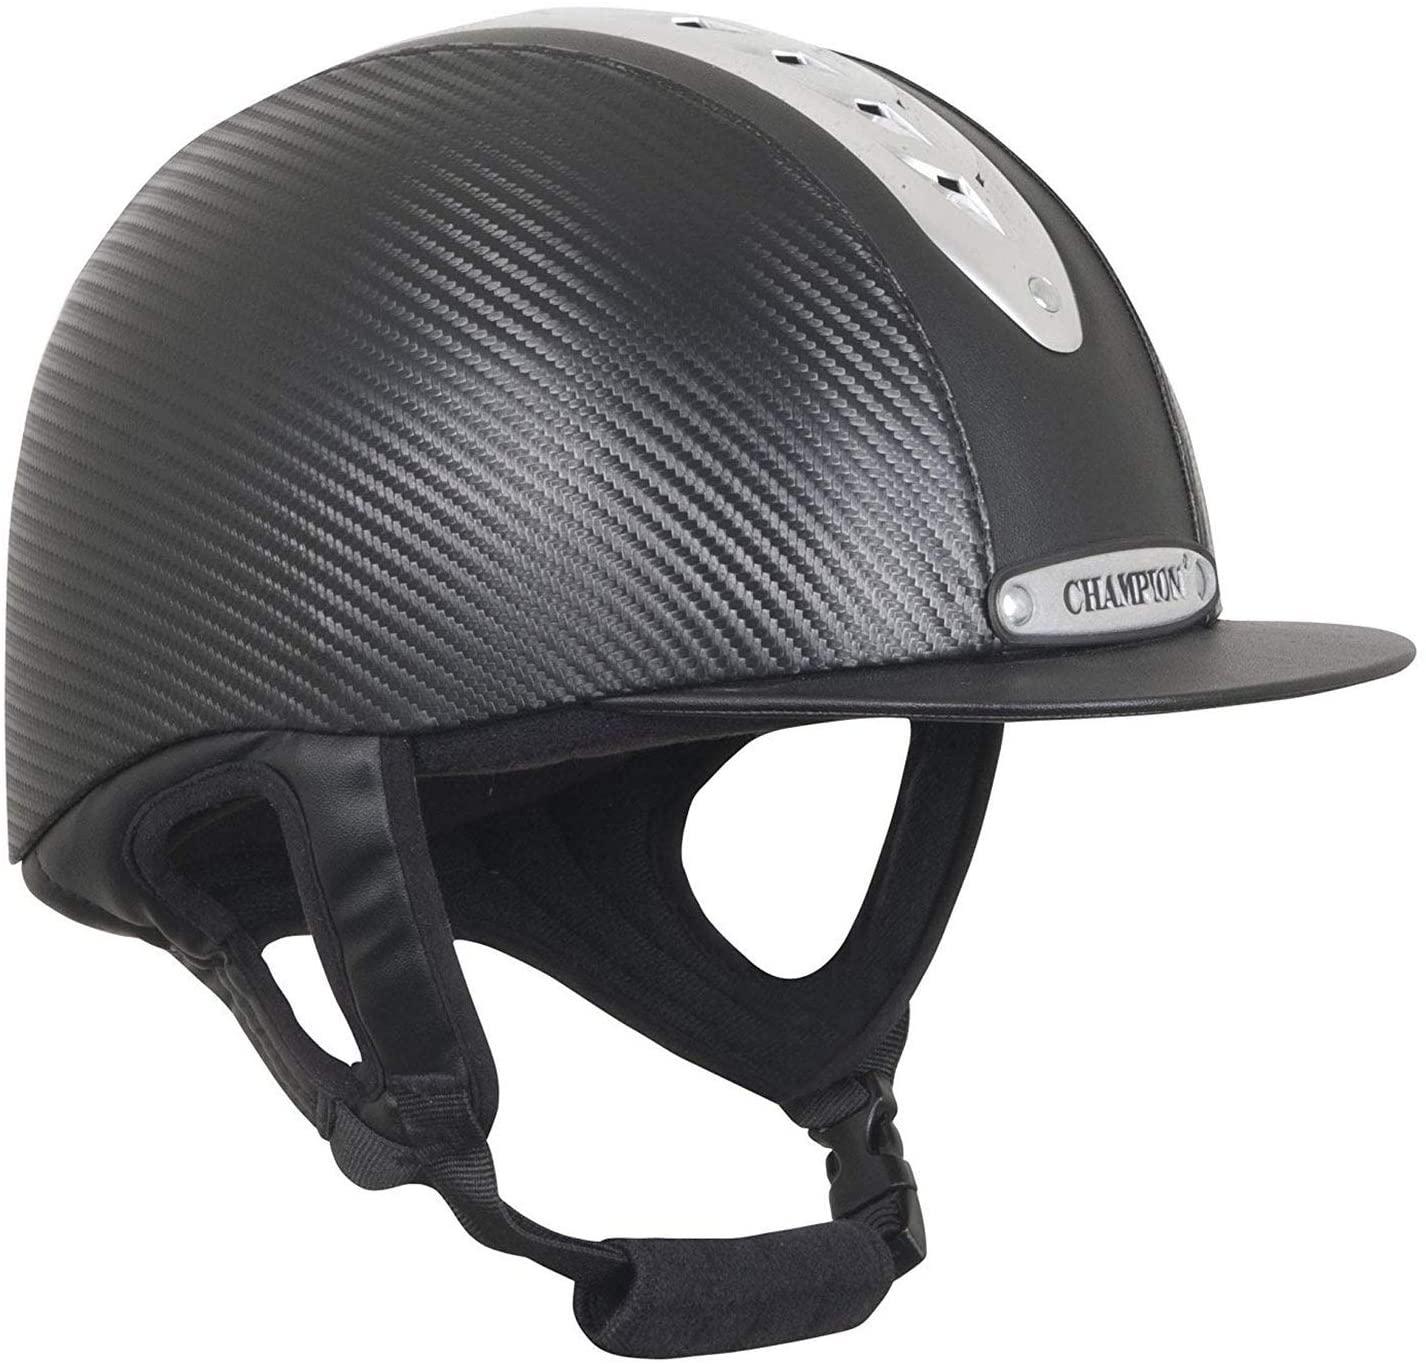 Champion Evolution Pro Helmet 6 7/8